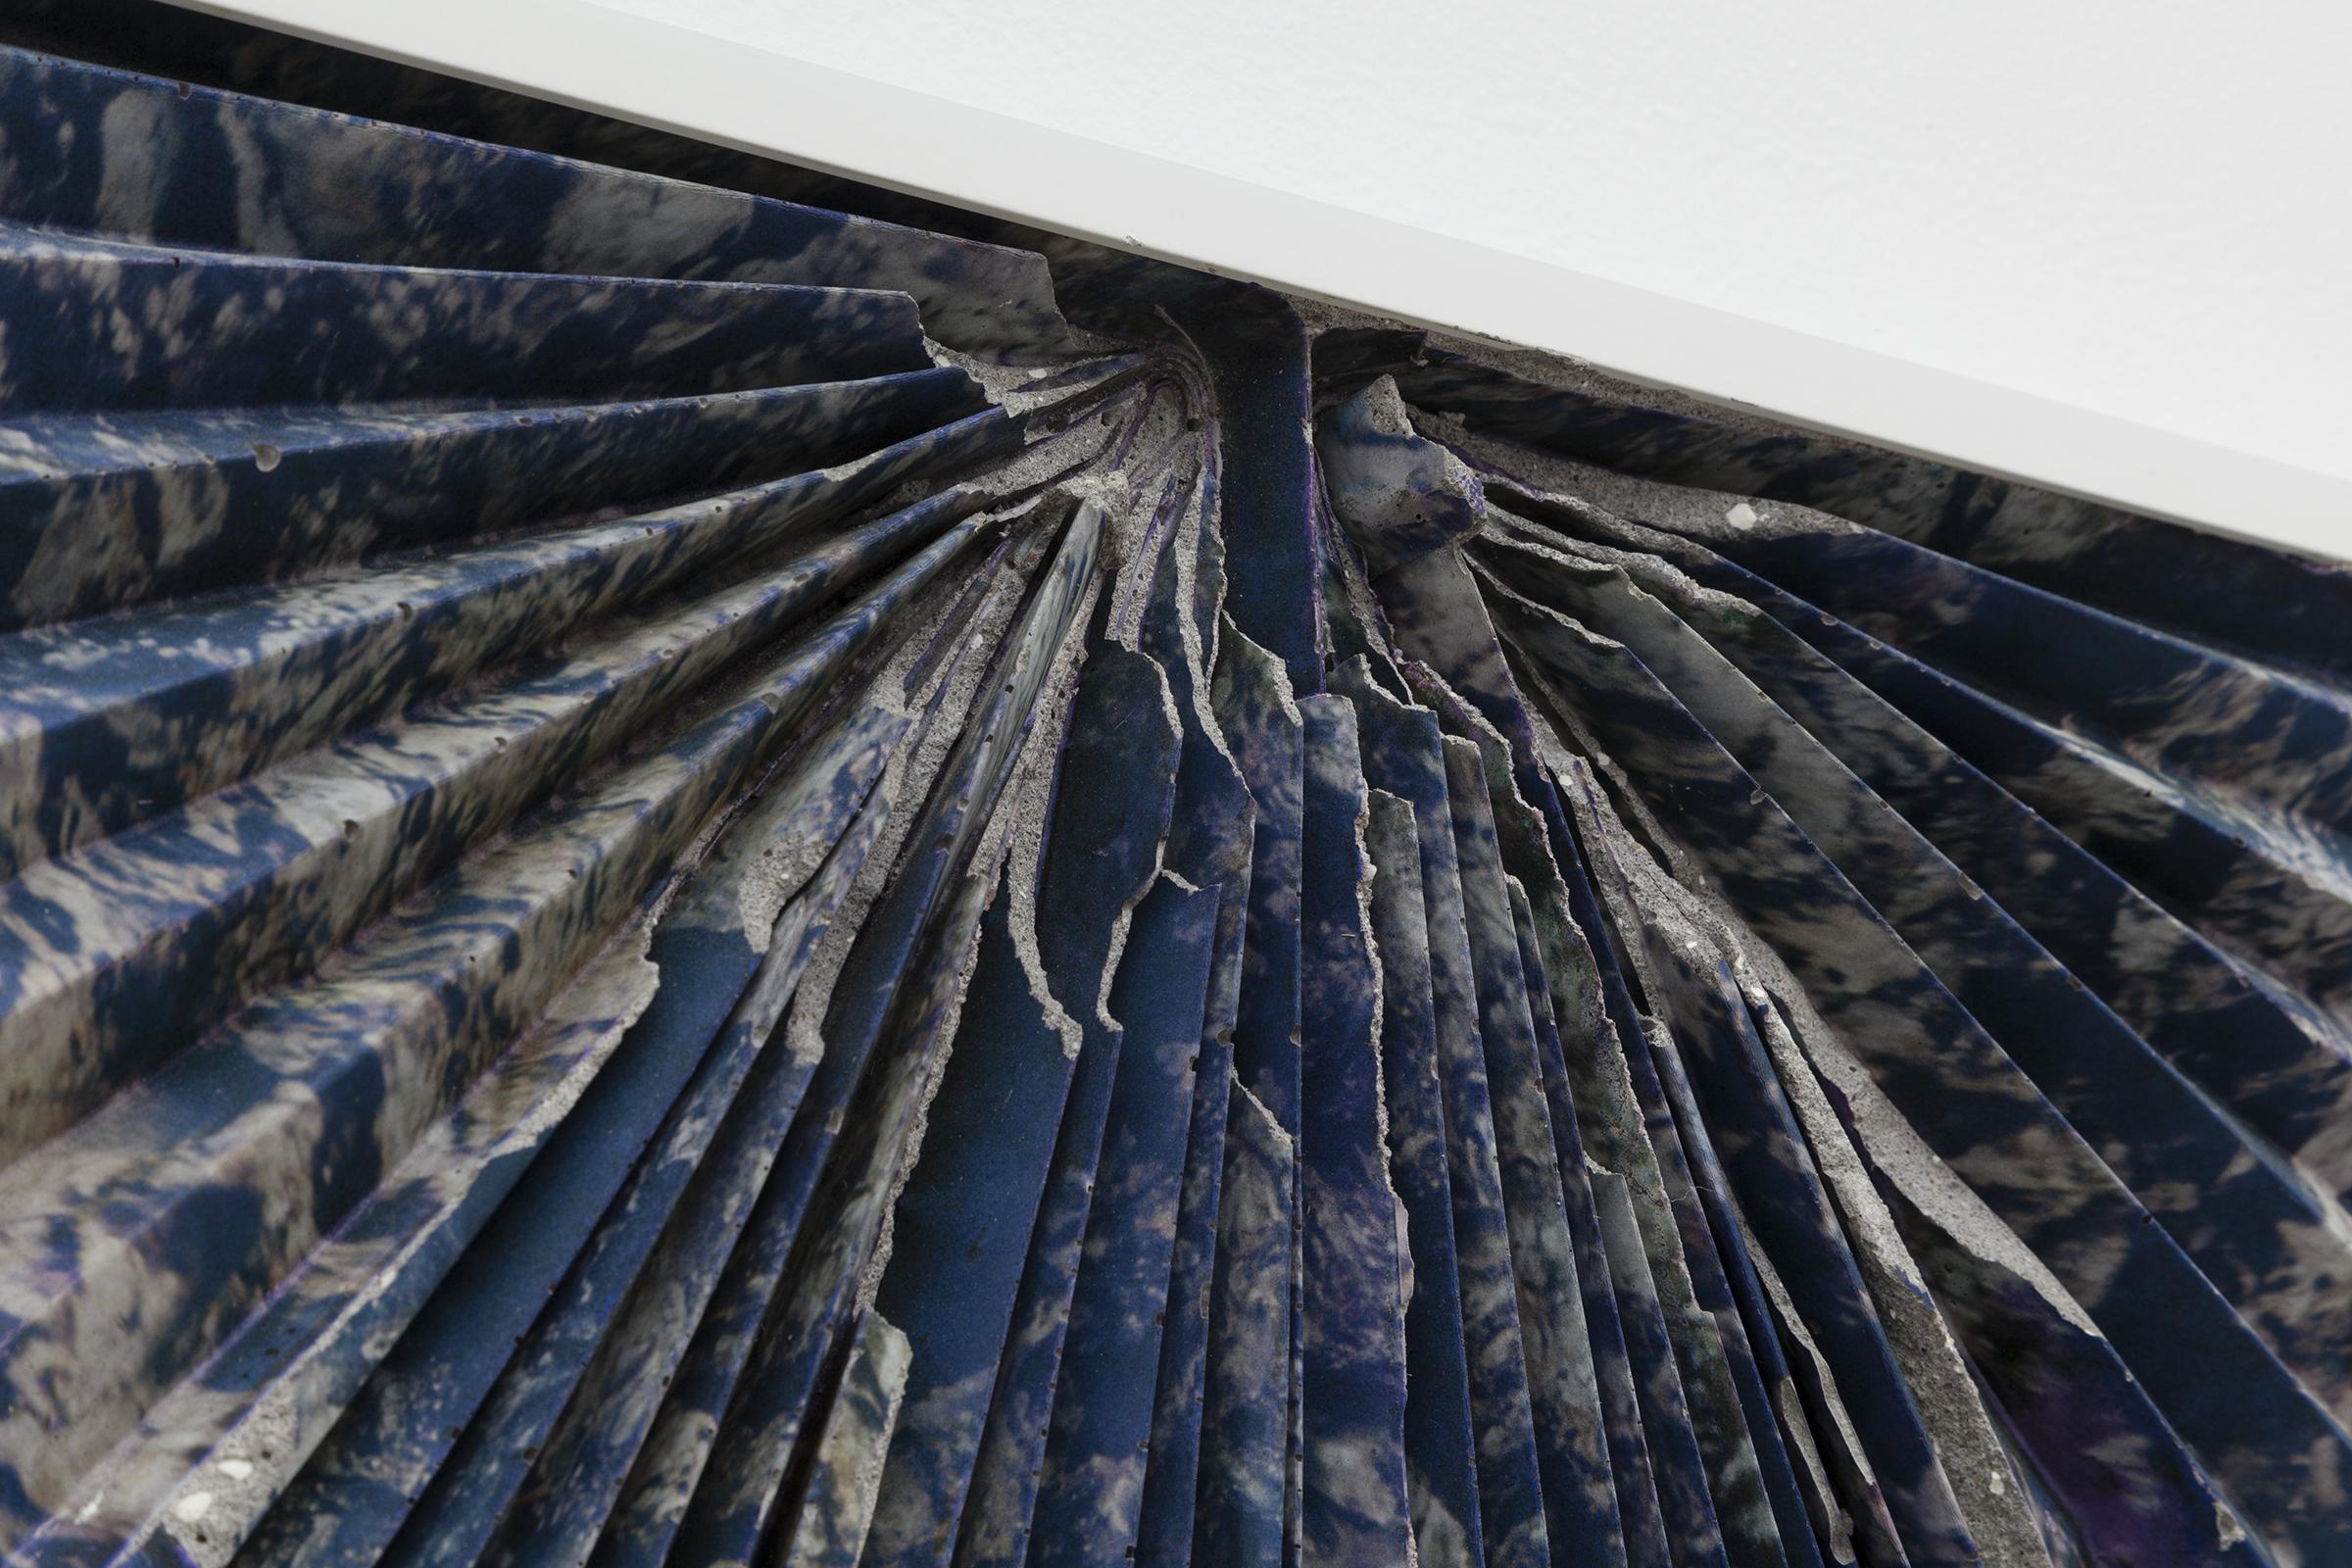 Letha Wilson, Lava Concrete Ripple  (detail), 2015,concrete, emulsion transfer, aluminum frame,24.375 x 28.375 x 1.5 in